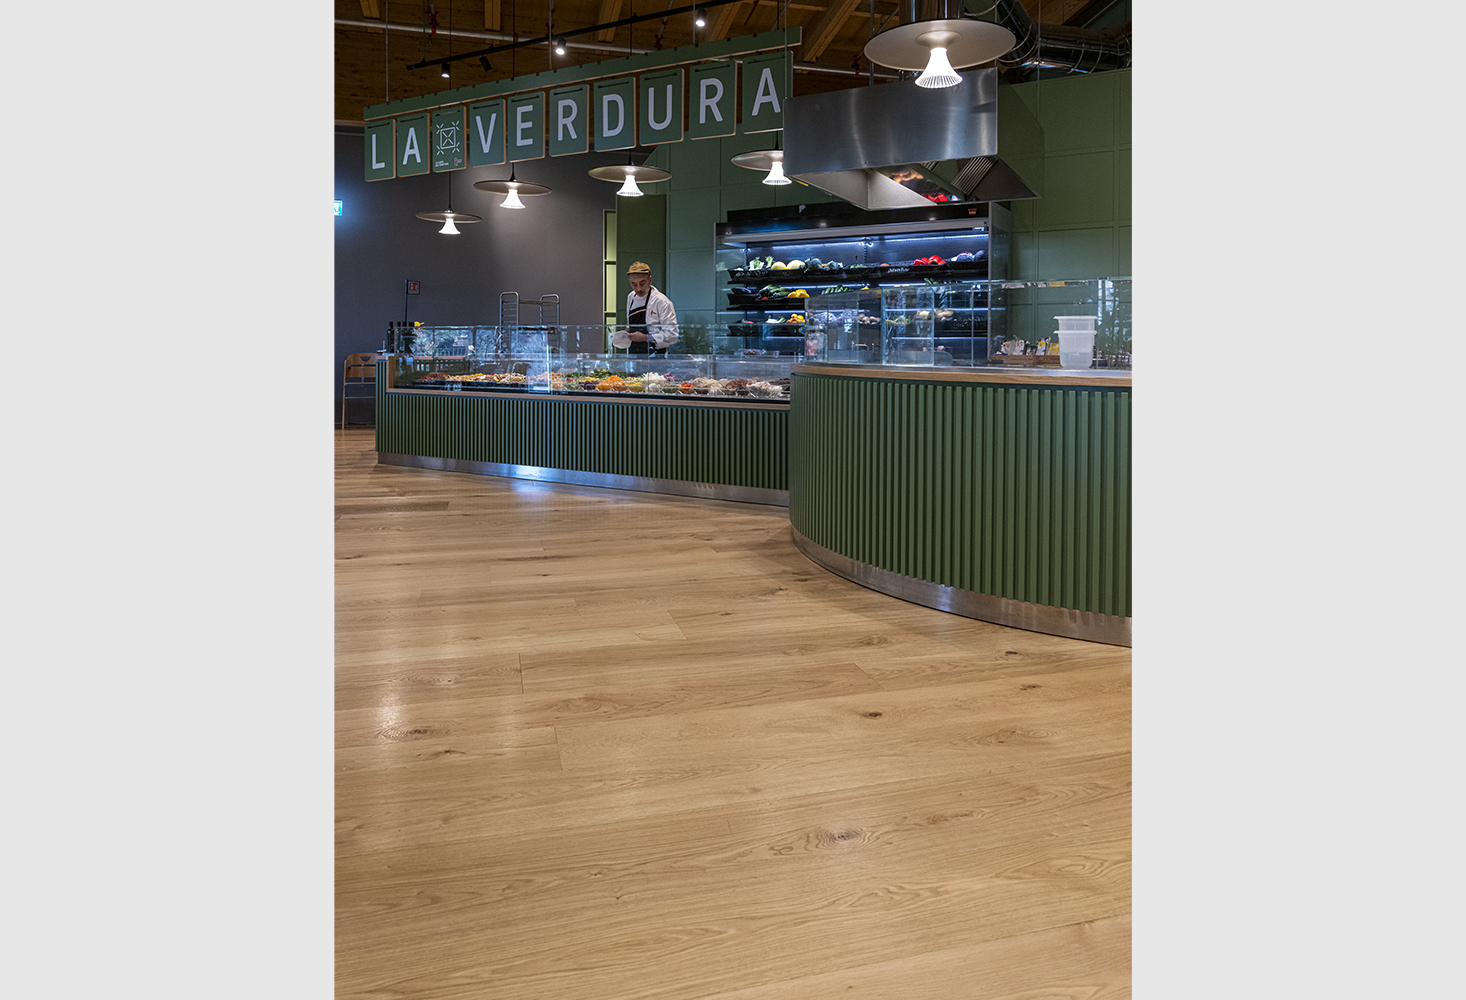 '500, European Oak Rusticone, brushed unfinished Maxi, European Oak Rusticone, brushed unfinished